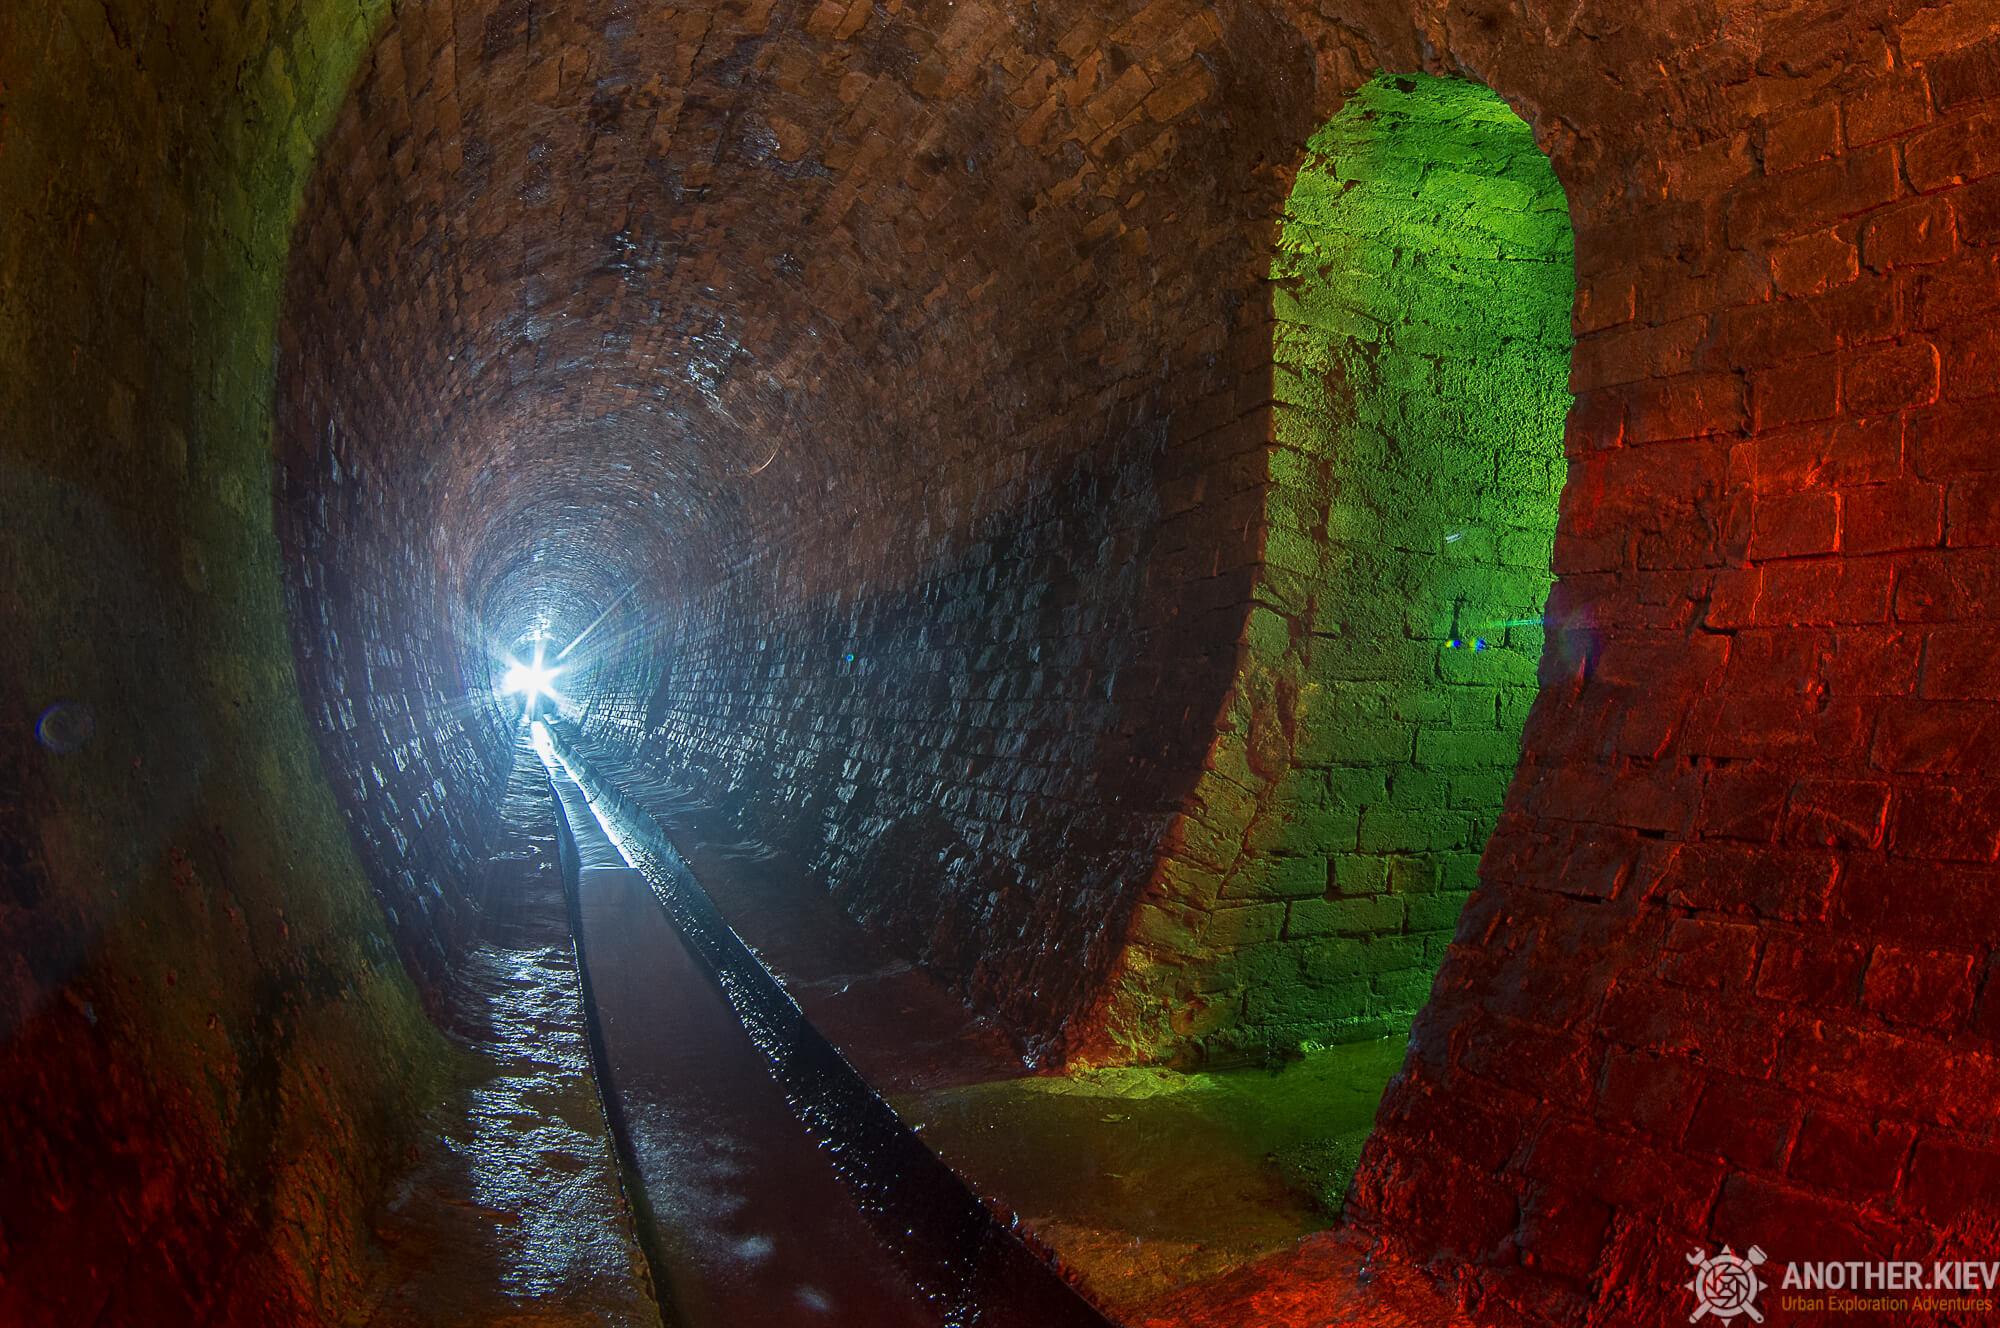 klov_IMGP3141 Underground River Klov